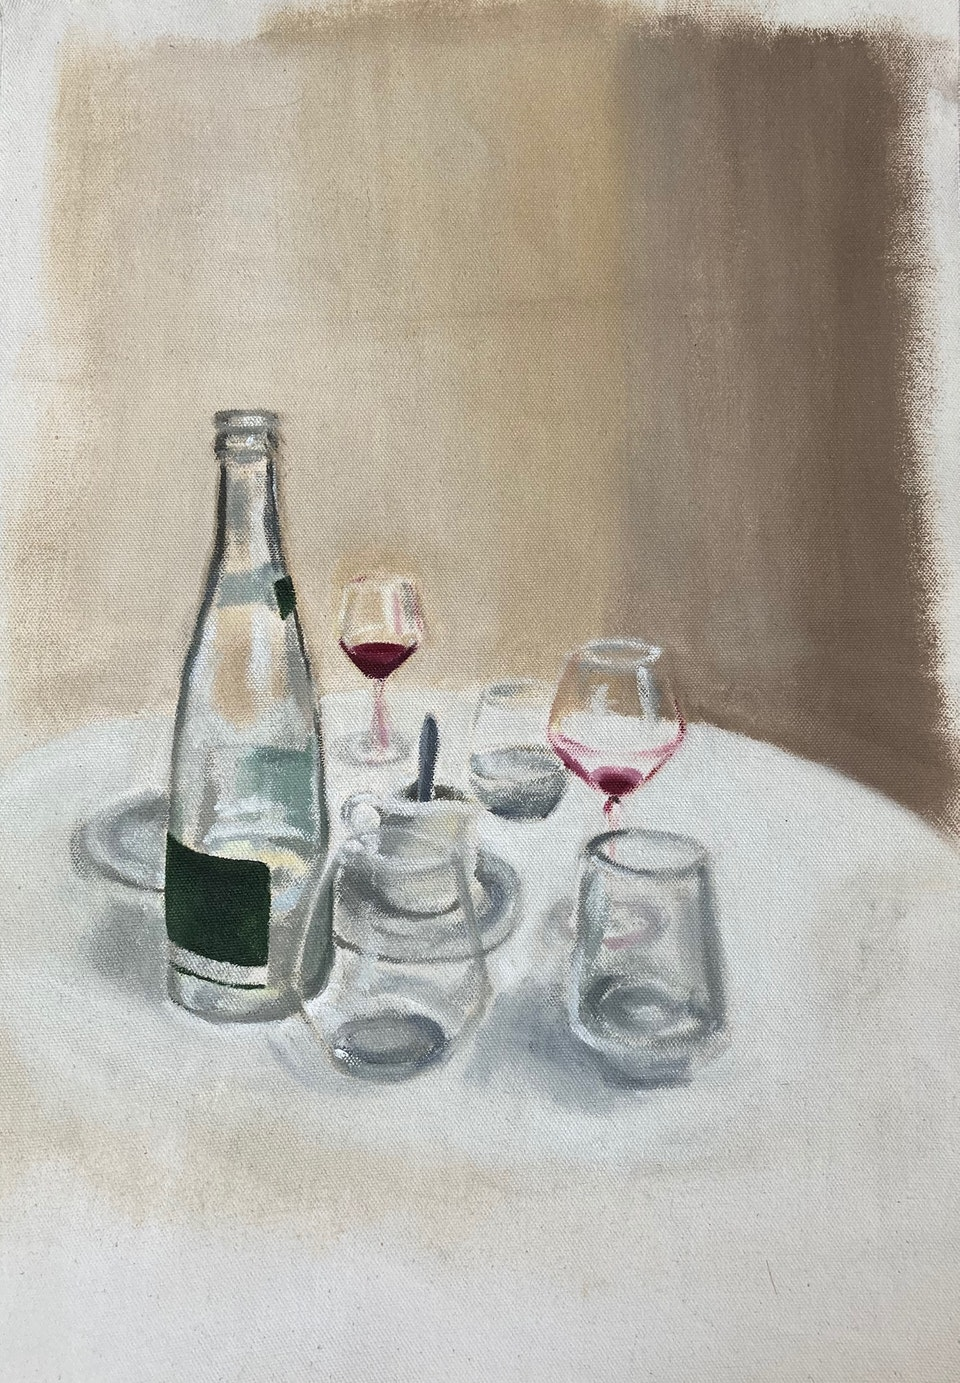 Realised Work - Soufflé - 2020 - Oil on Canvas - 30 x 42cm